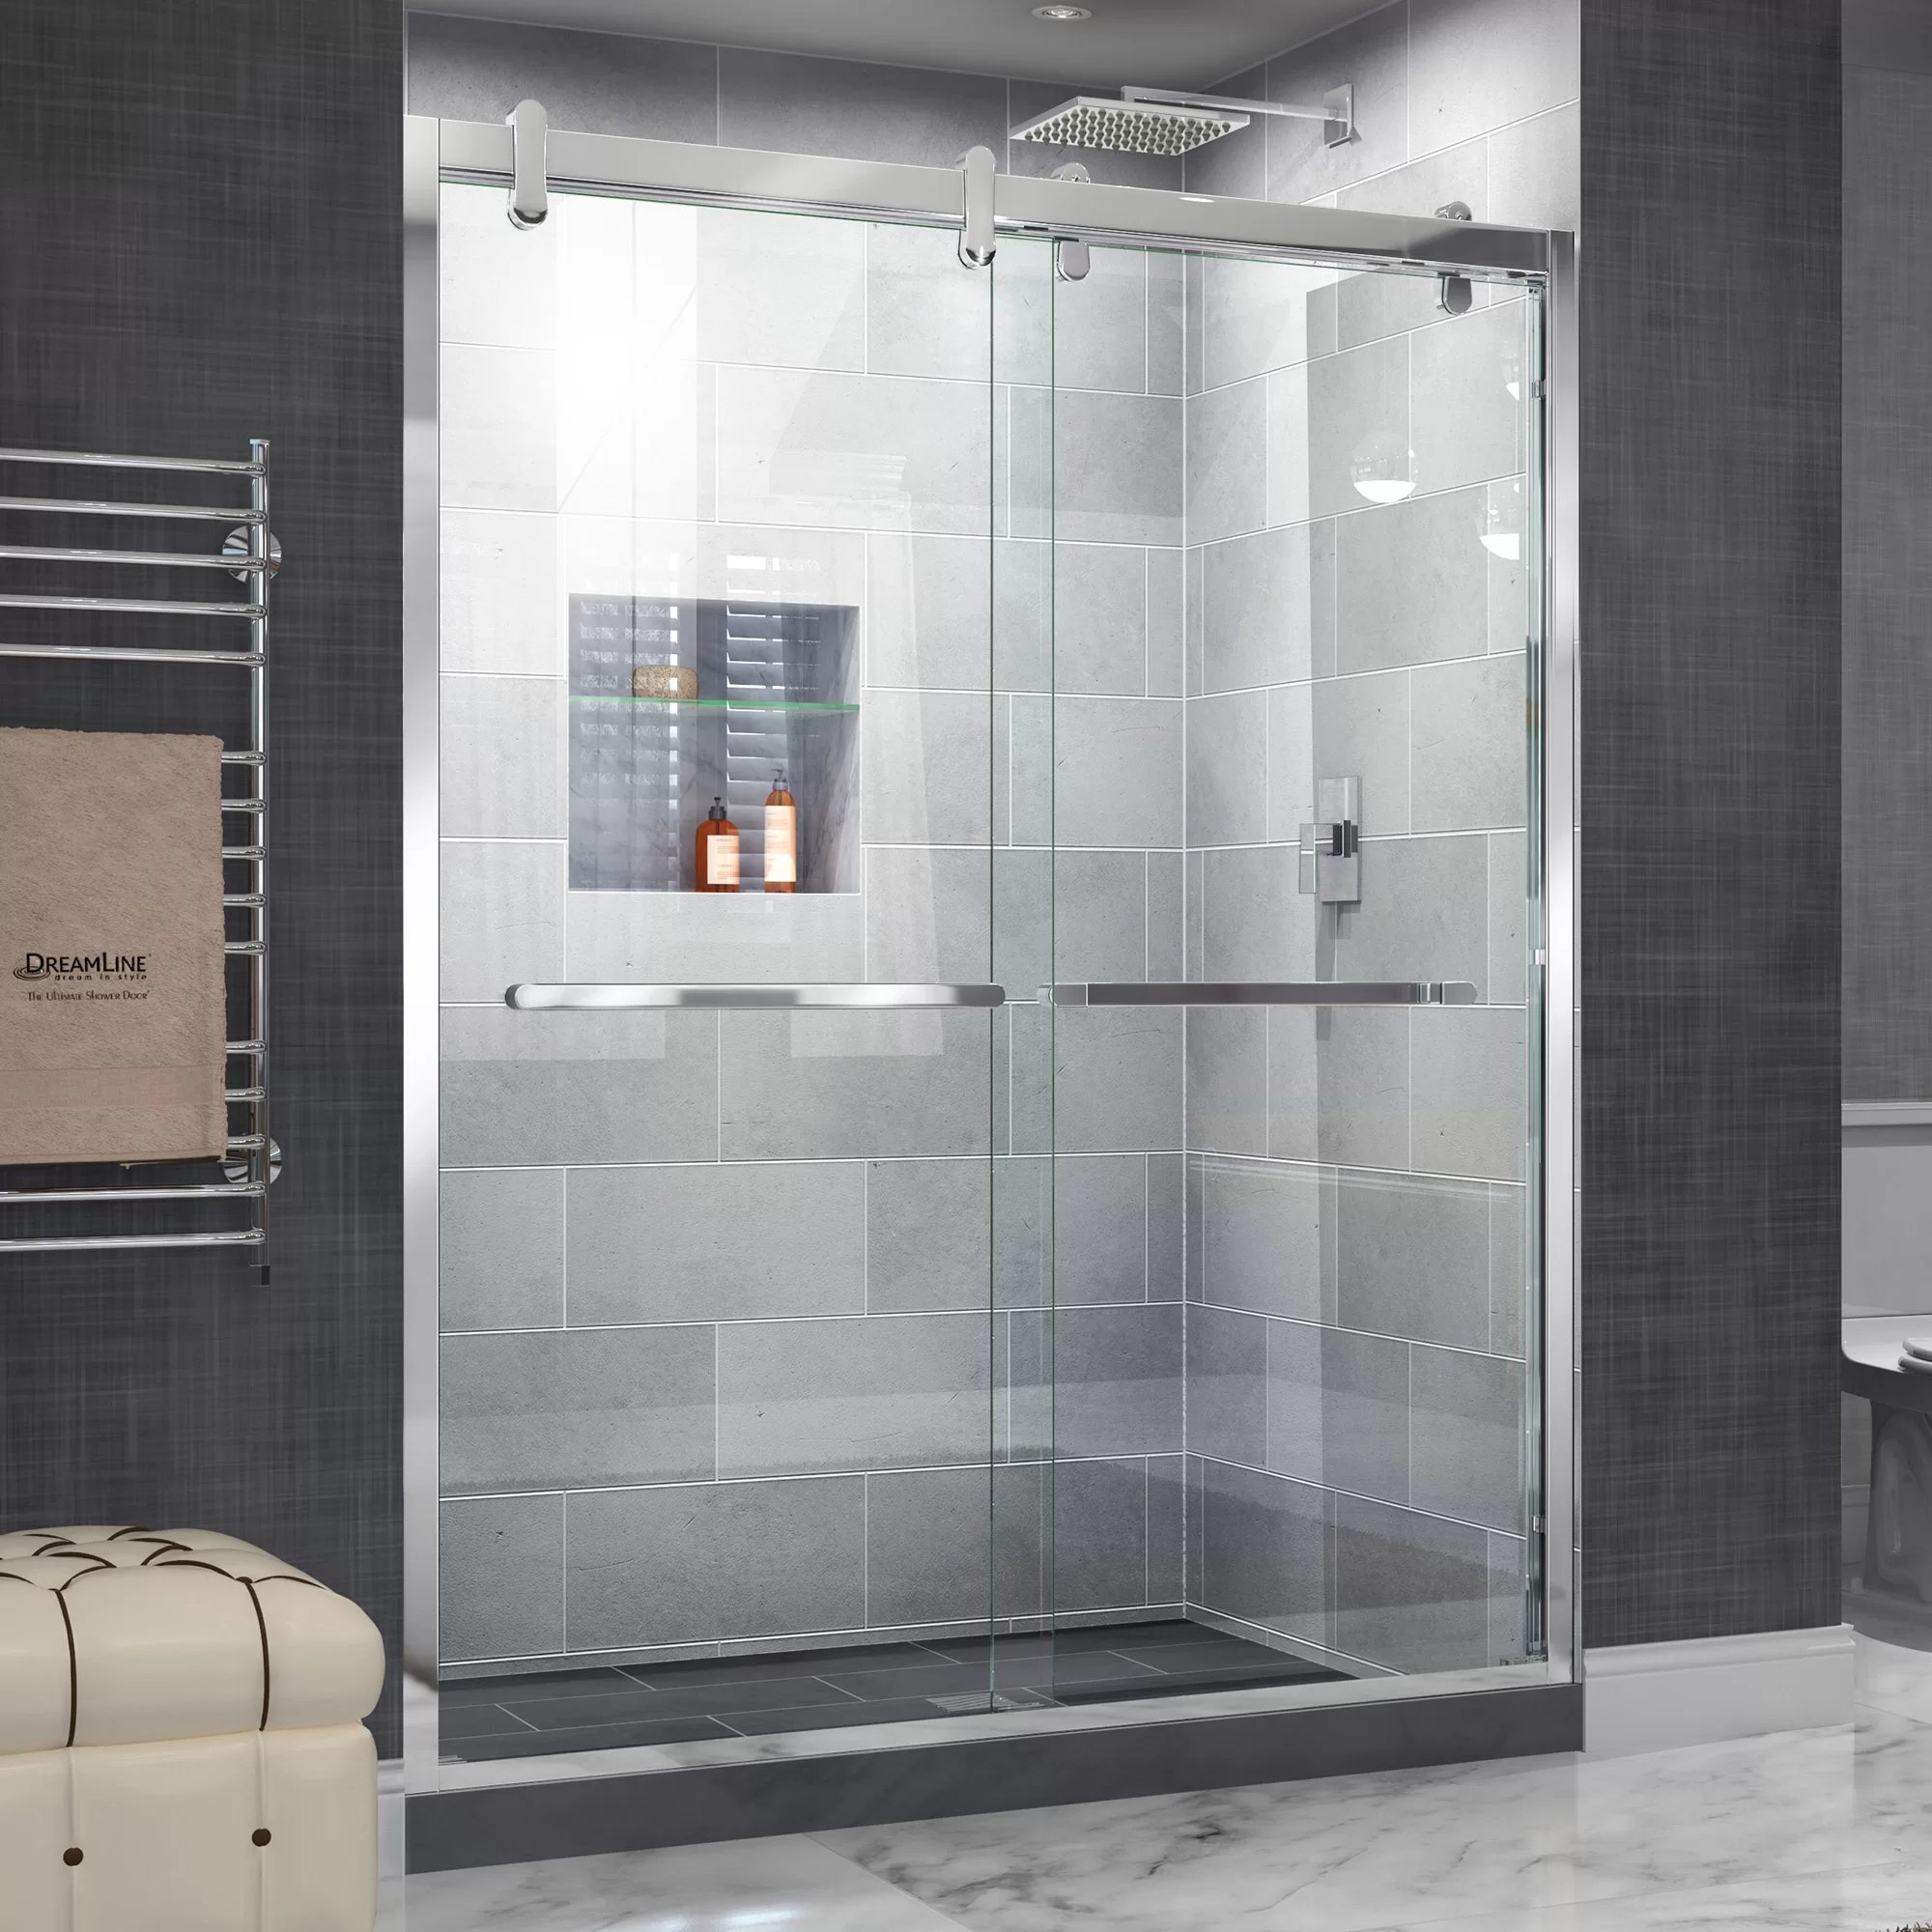 Cavalier 60 X 77 38 Bypass Semi Frameless Shower Door With Clearmax Technology